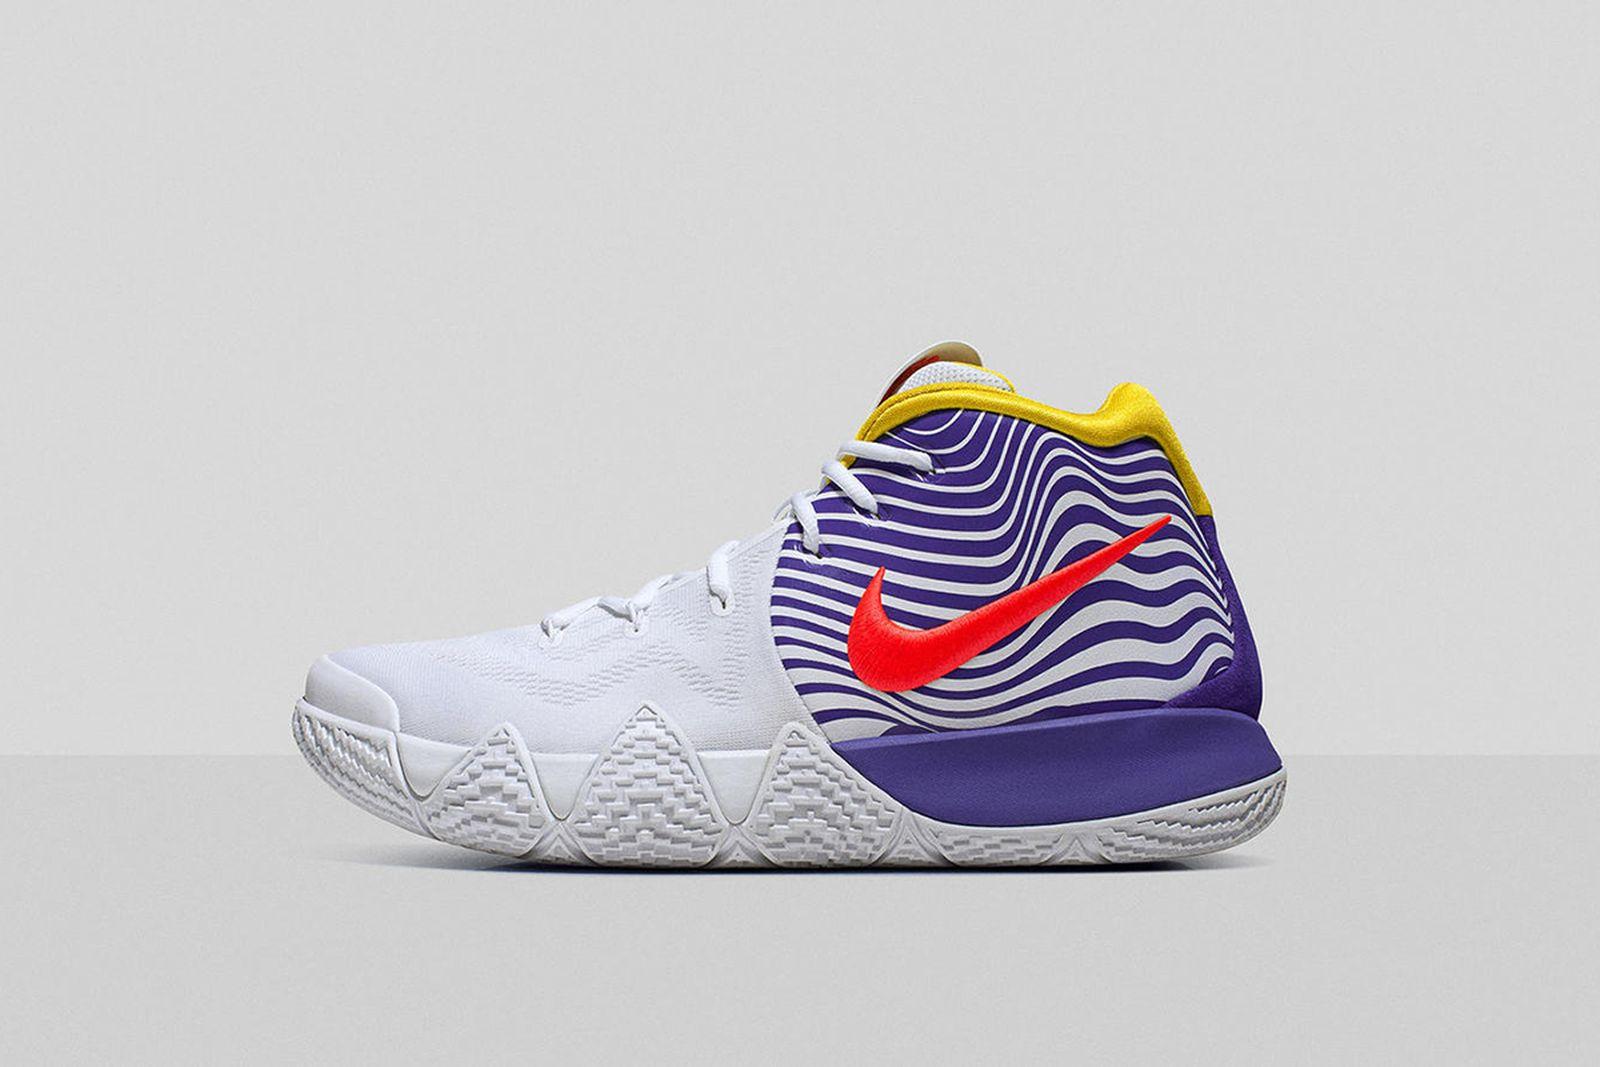 oportunidad tráfico Puntero  Nike Debuts Colorful 2018 WNBA All-Star Game Sneakers